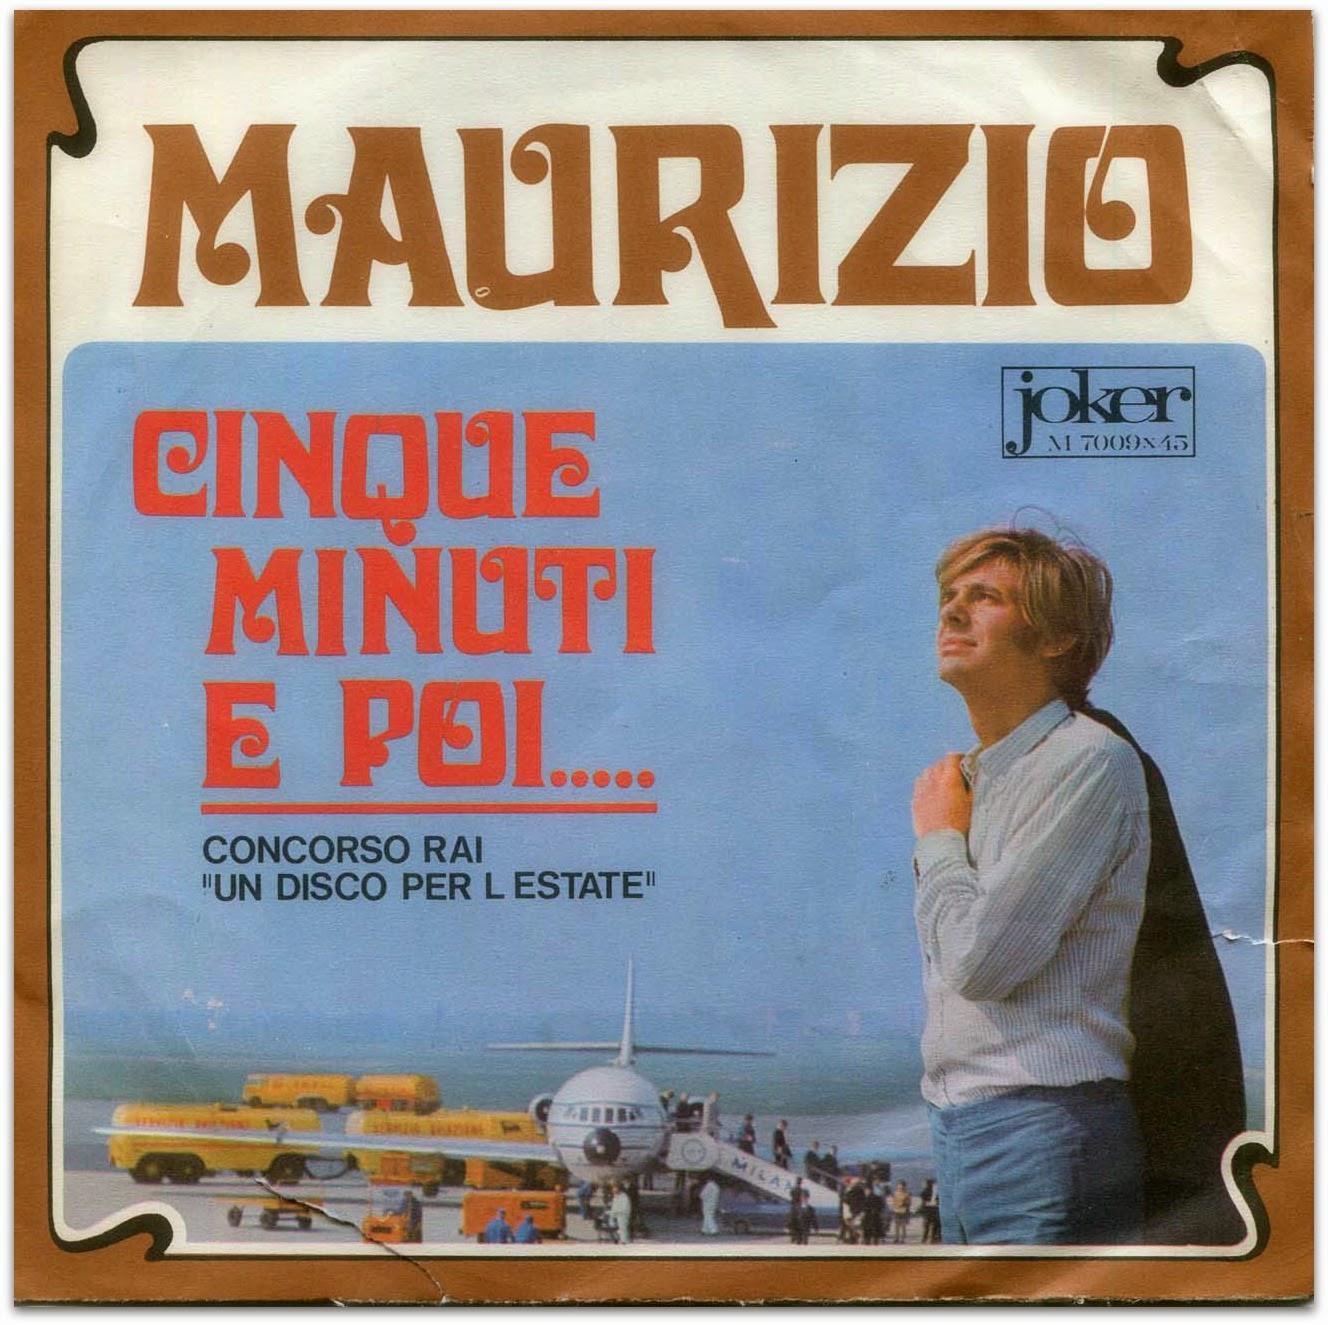 MAURIZIO-5-MINUTI-E-POI-NEW-DADA